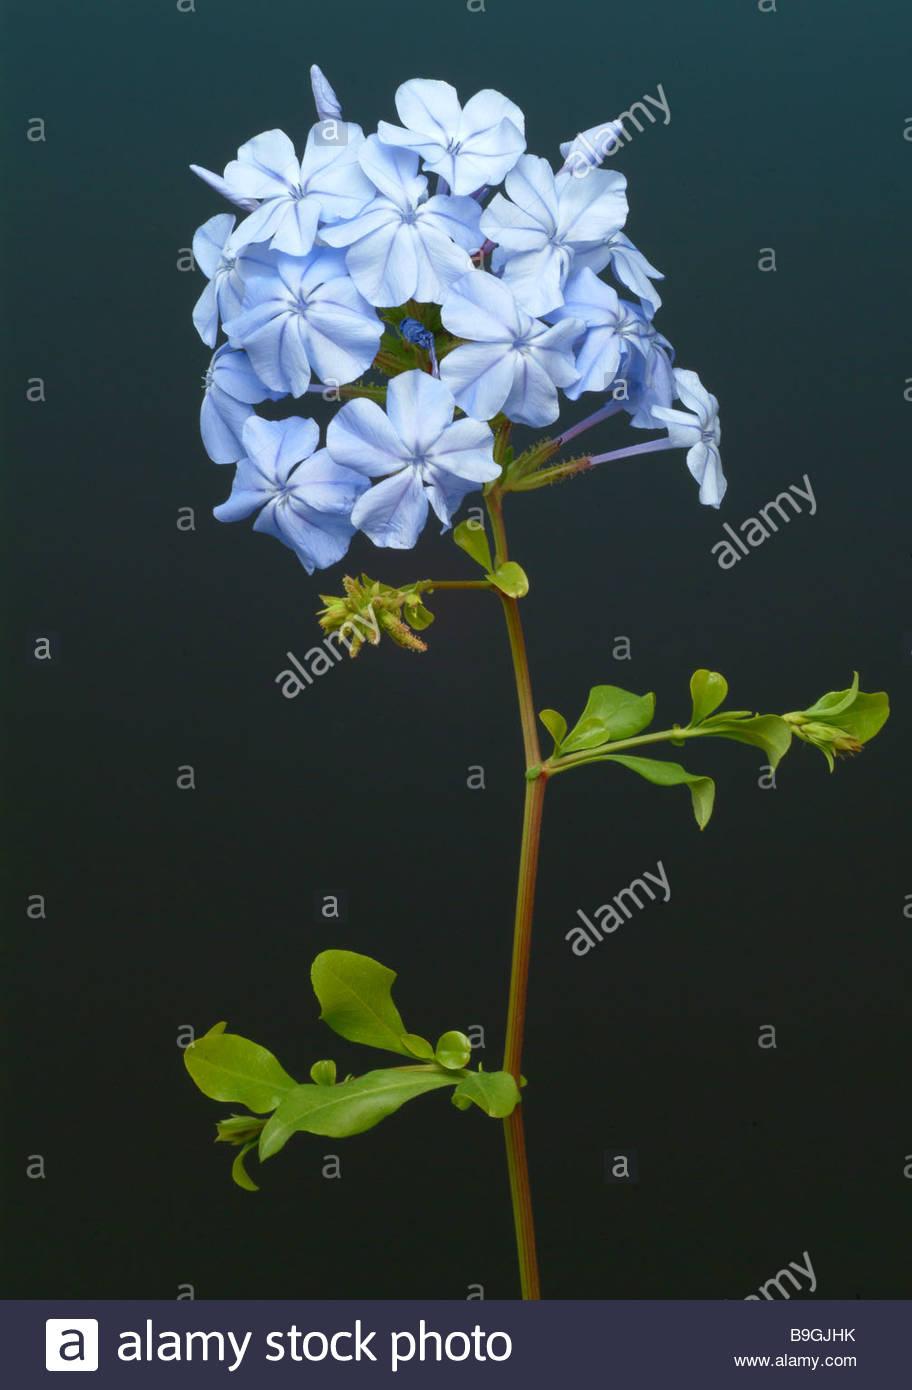 Plumbago Flower Stock Photos & Plumbago Flower Stock Images.